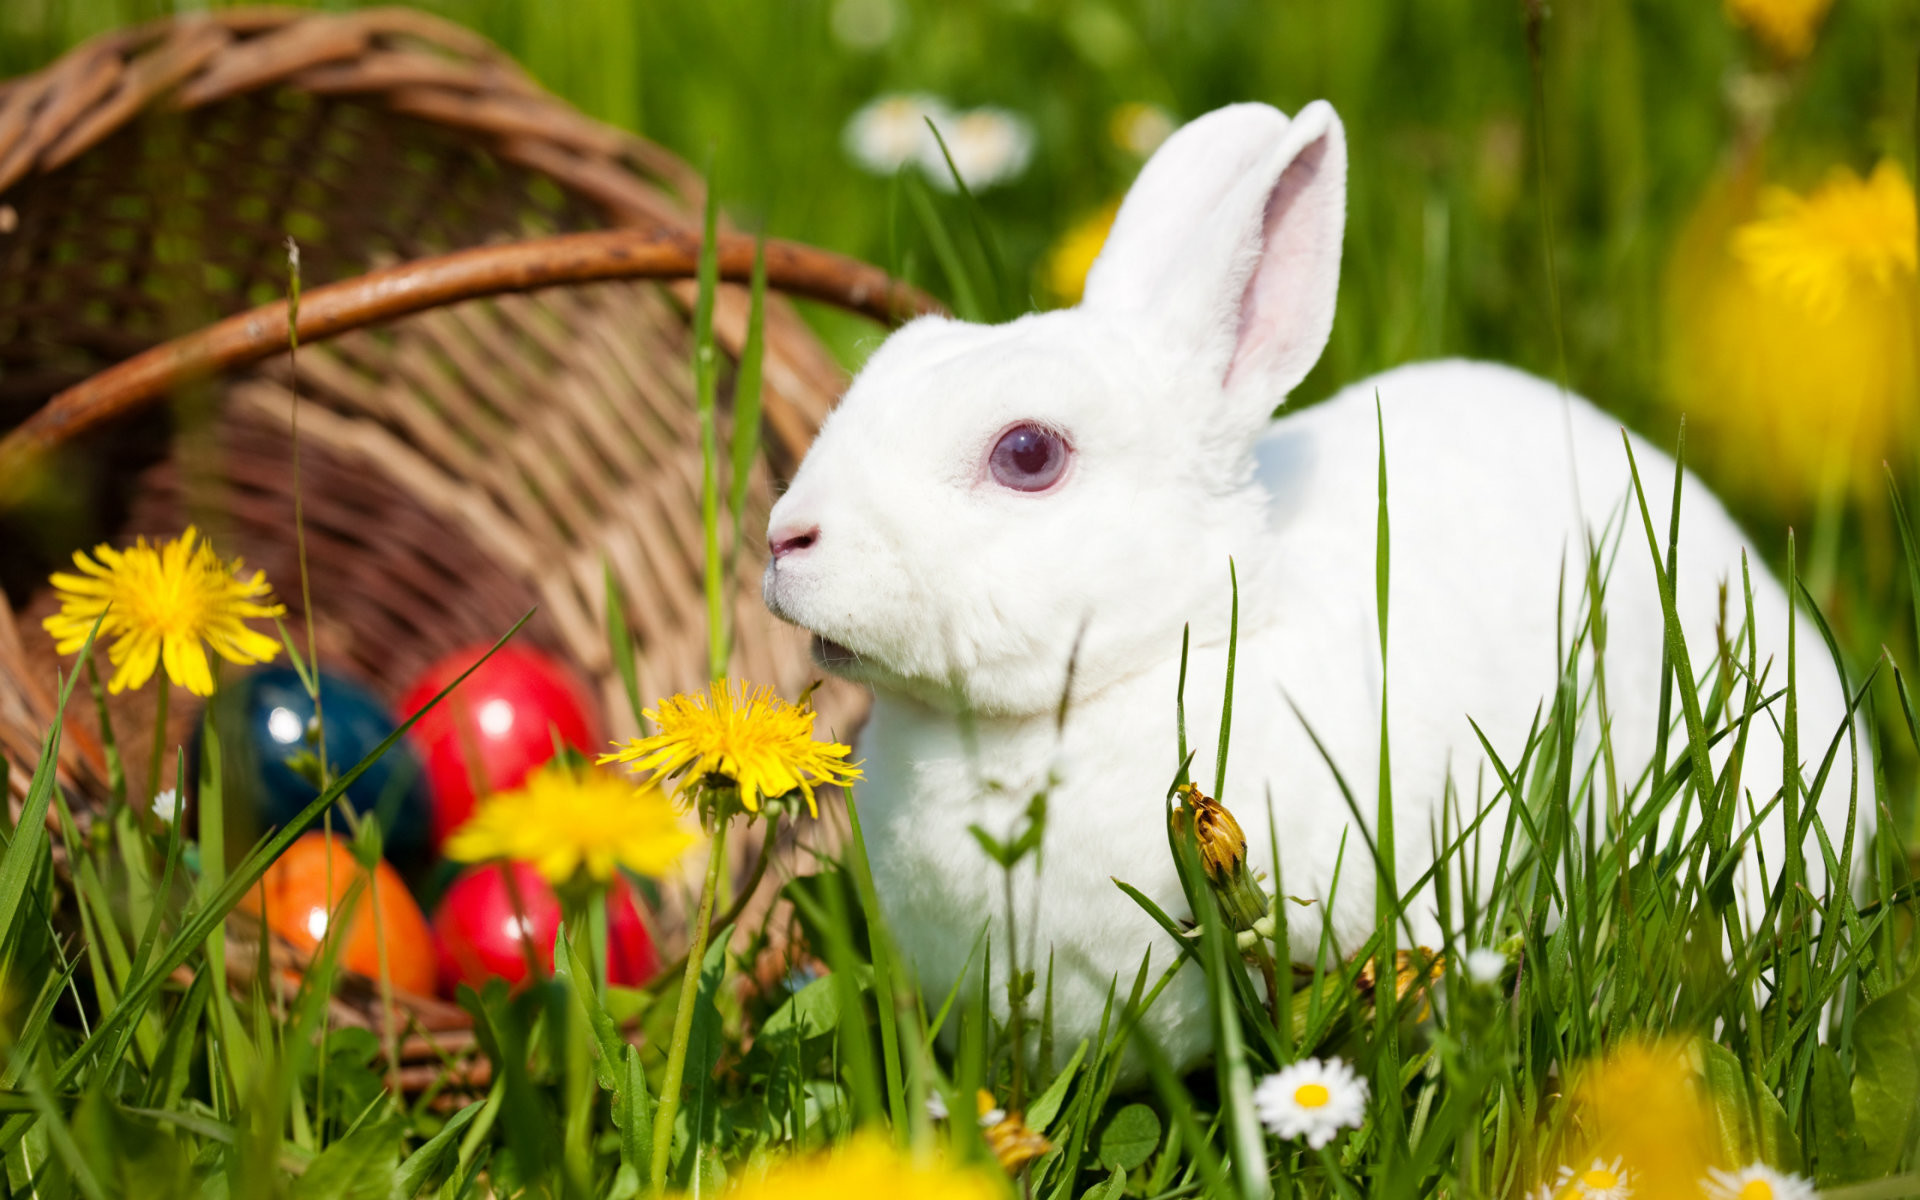 Cute Rabbit Wallpapers For Desktop